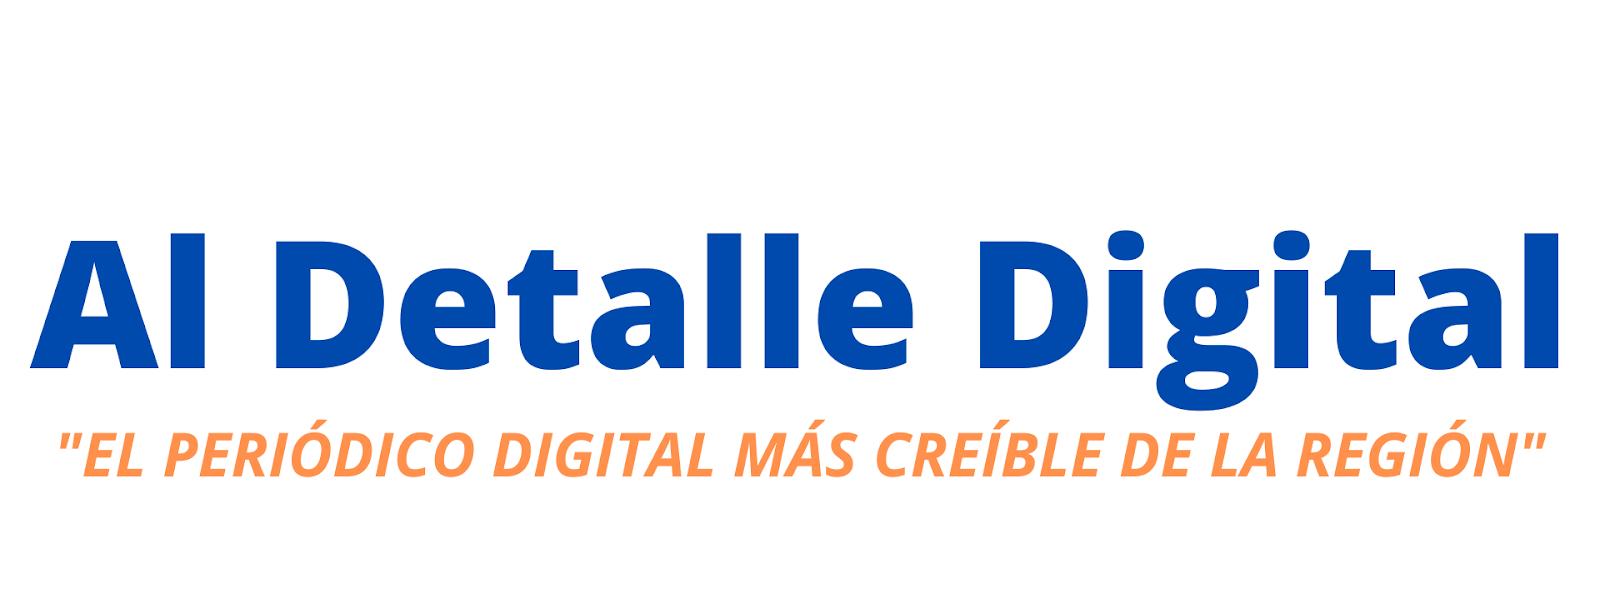 Al Detalle Digital.com